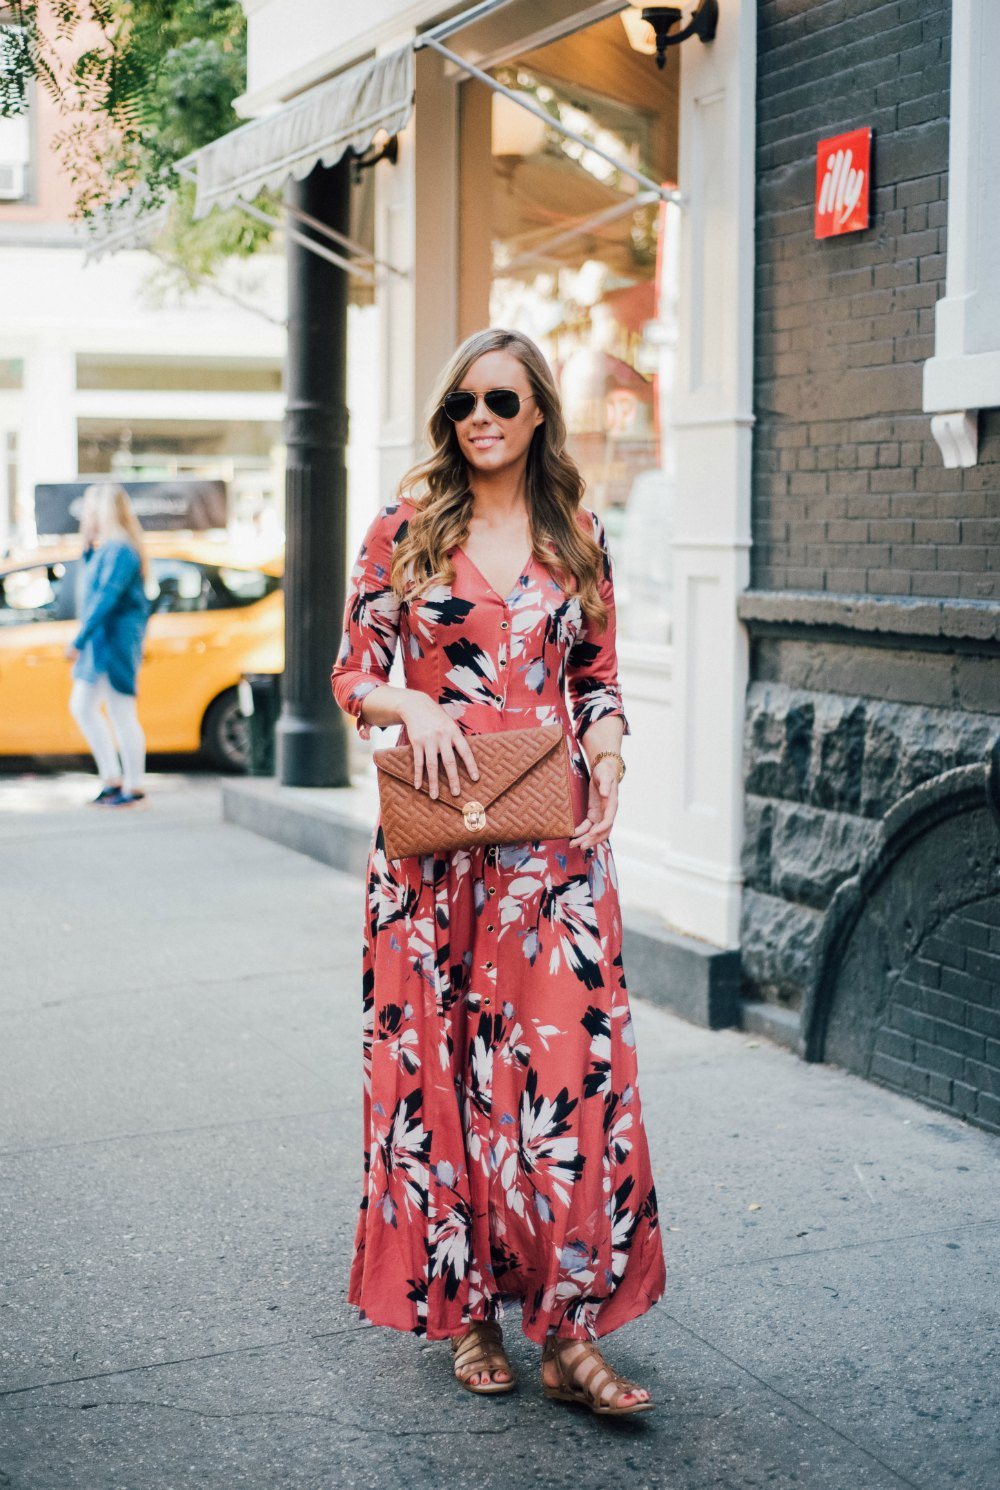 yumi kim maxi dress new york spring outfit soho lauren slade style elixir fashion blog 2